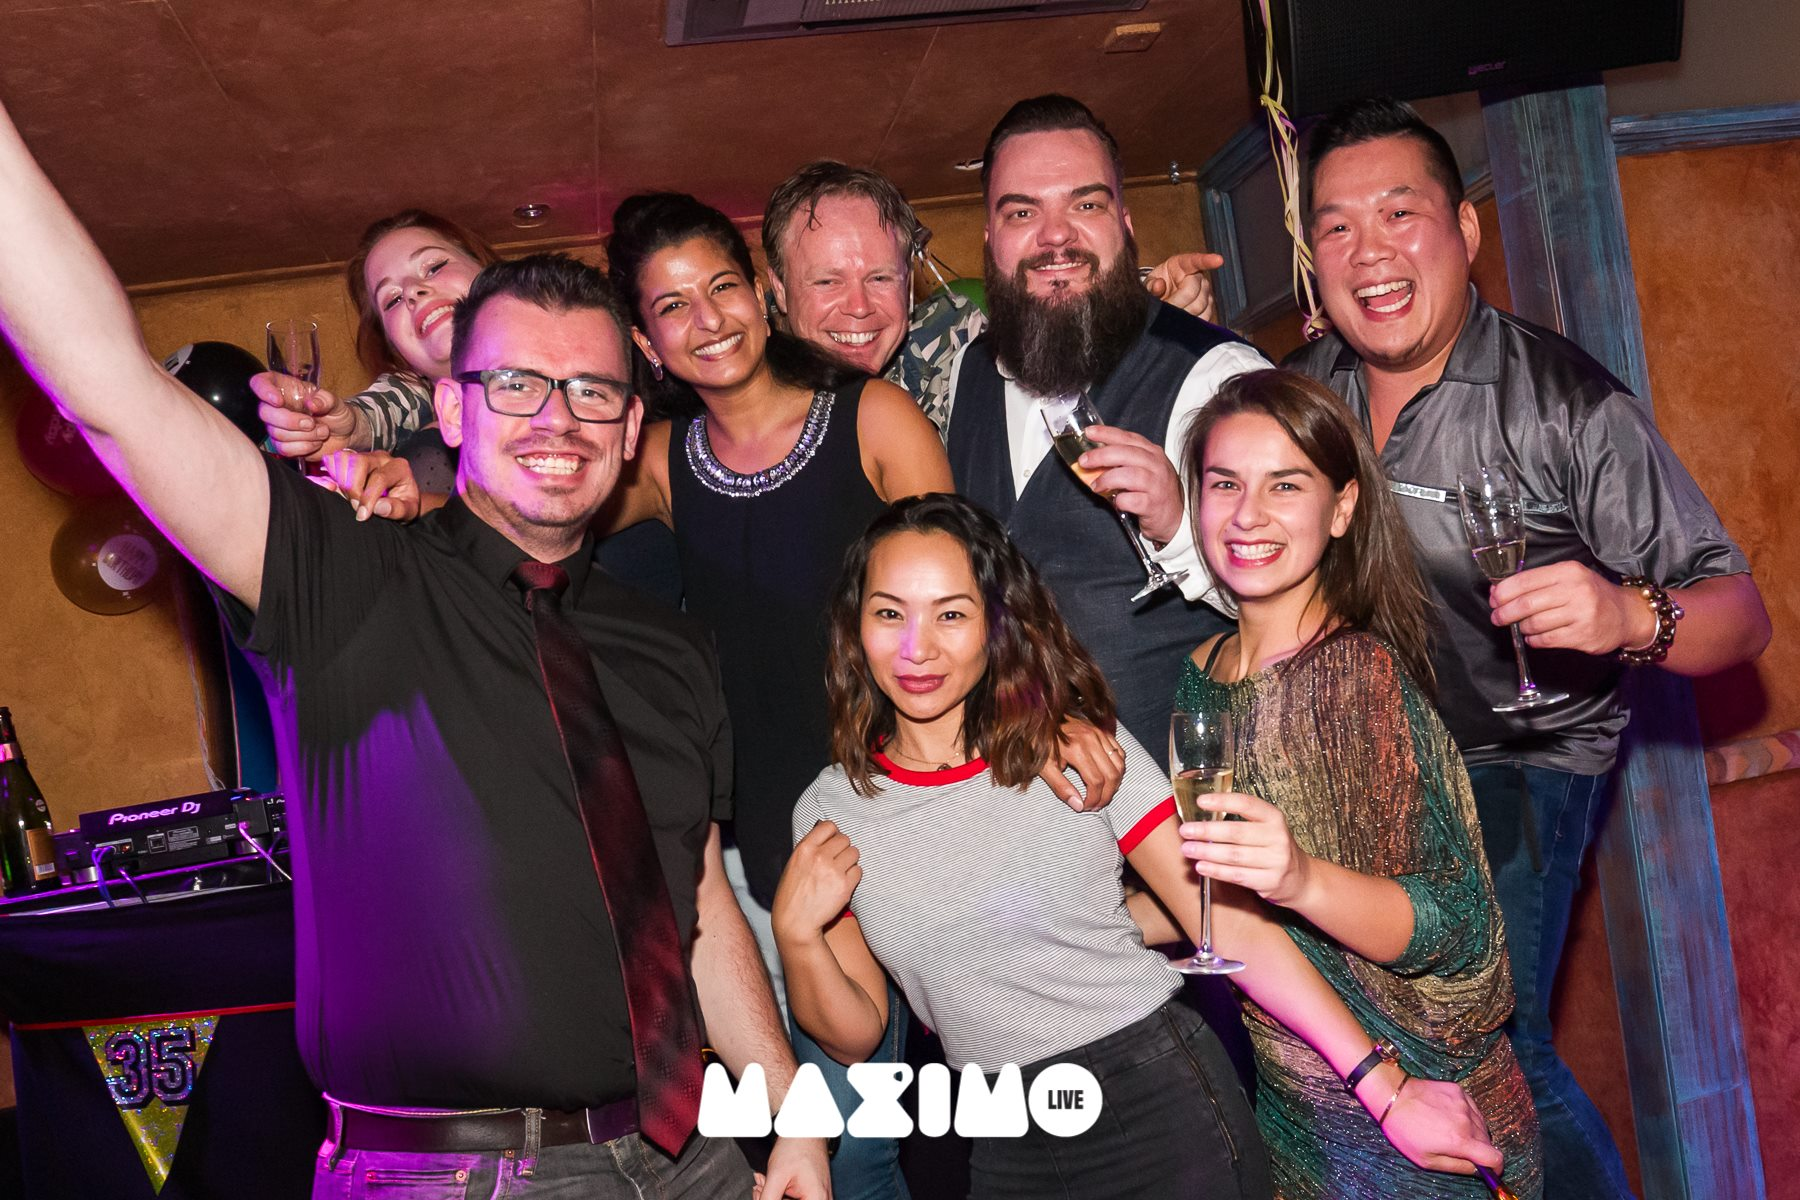 maximo dancing team